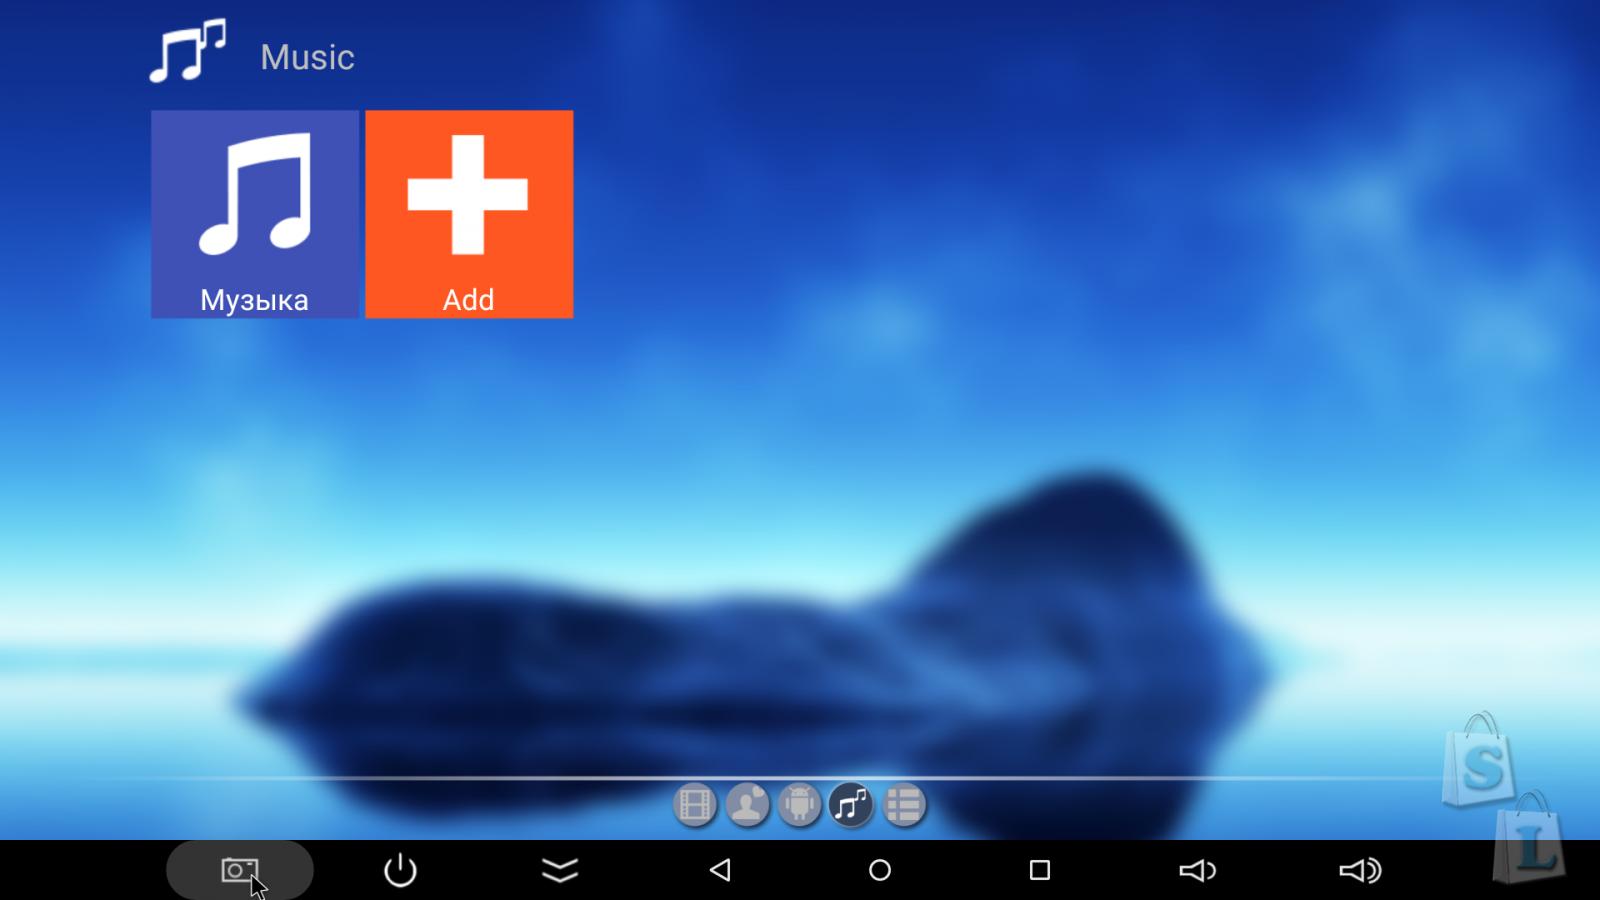 GearBest: Обзор Android Box Beelink MX64 - очень удачный вариант за свои деньги